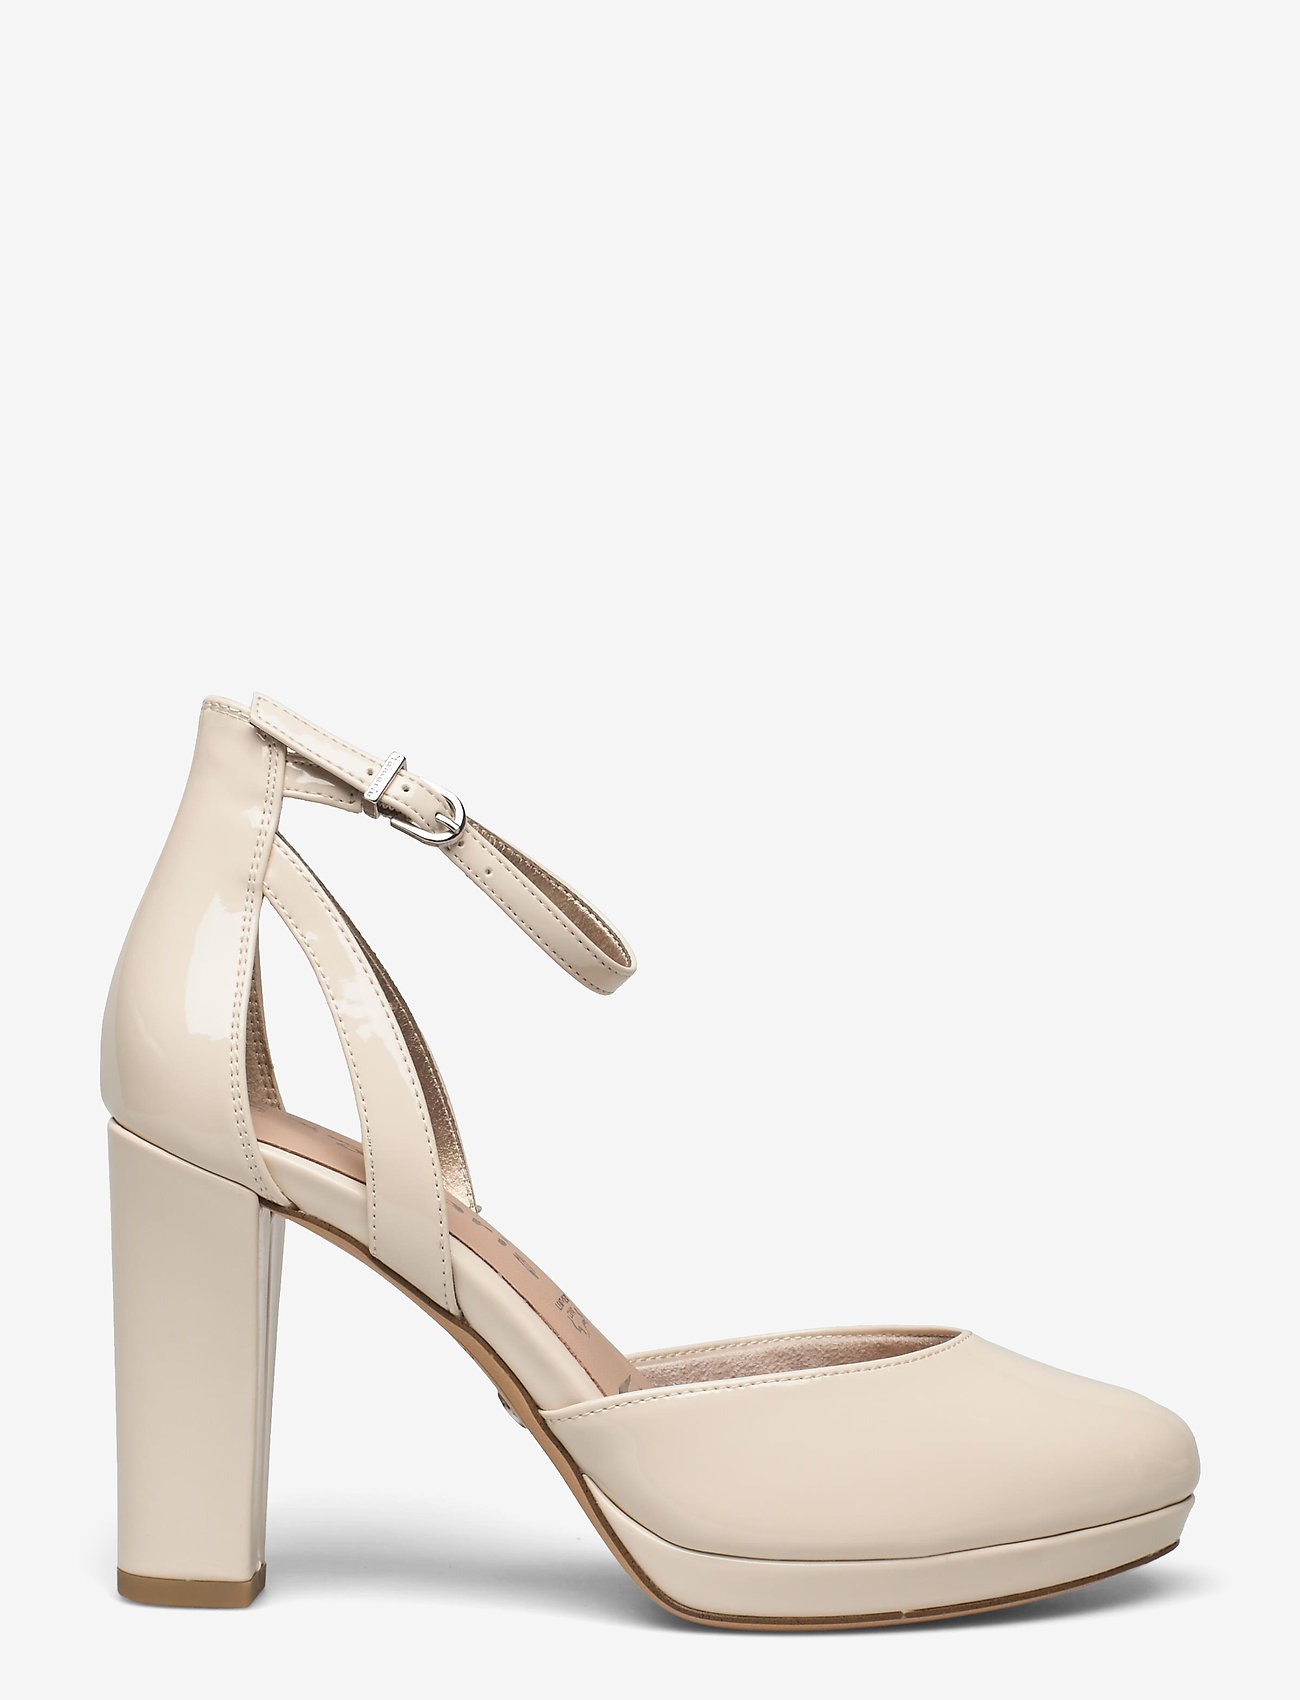 Tamaris - Woms Slip-on - klasiski augstpapēžu apavi - nude patent - 1